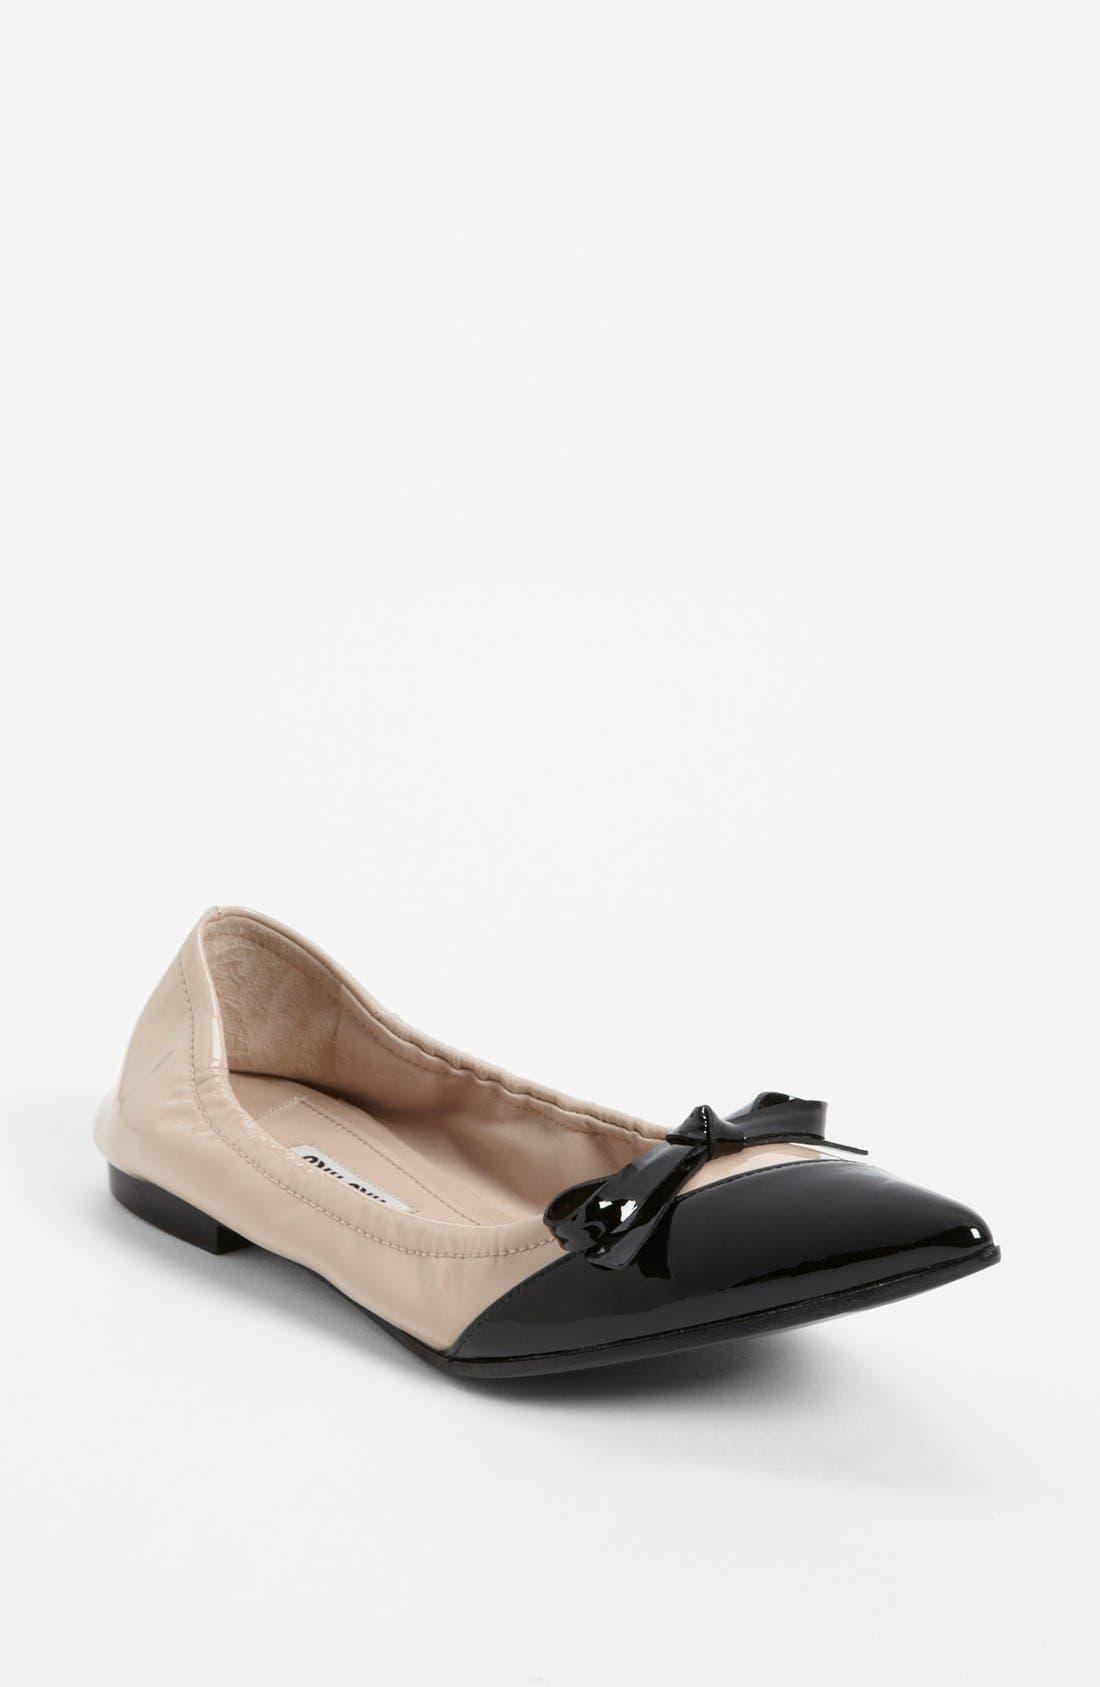 Main Image - Miu Miu Point Toe Ballet Flat